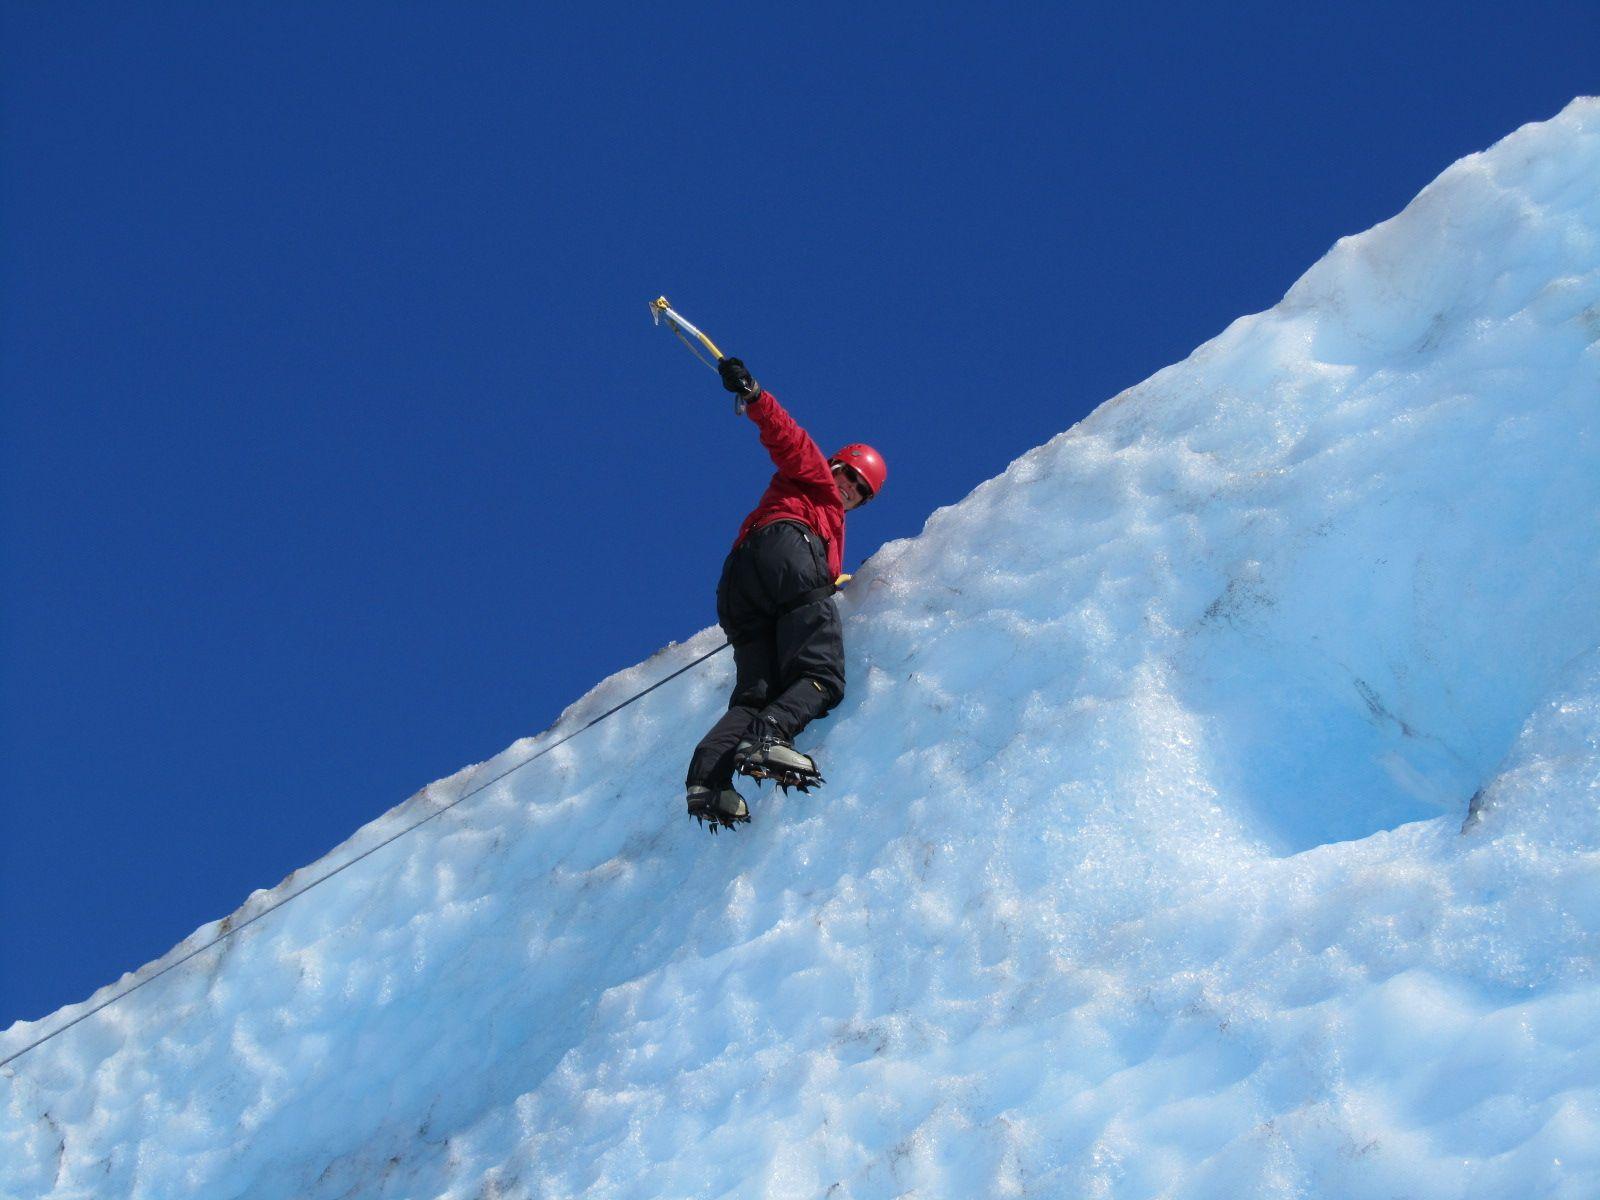 Ice Climbing Mendenhall Glacier AK  copyrighted 2014 Dark Woods Studios, Ltd. Co. dwoodstudio.com